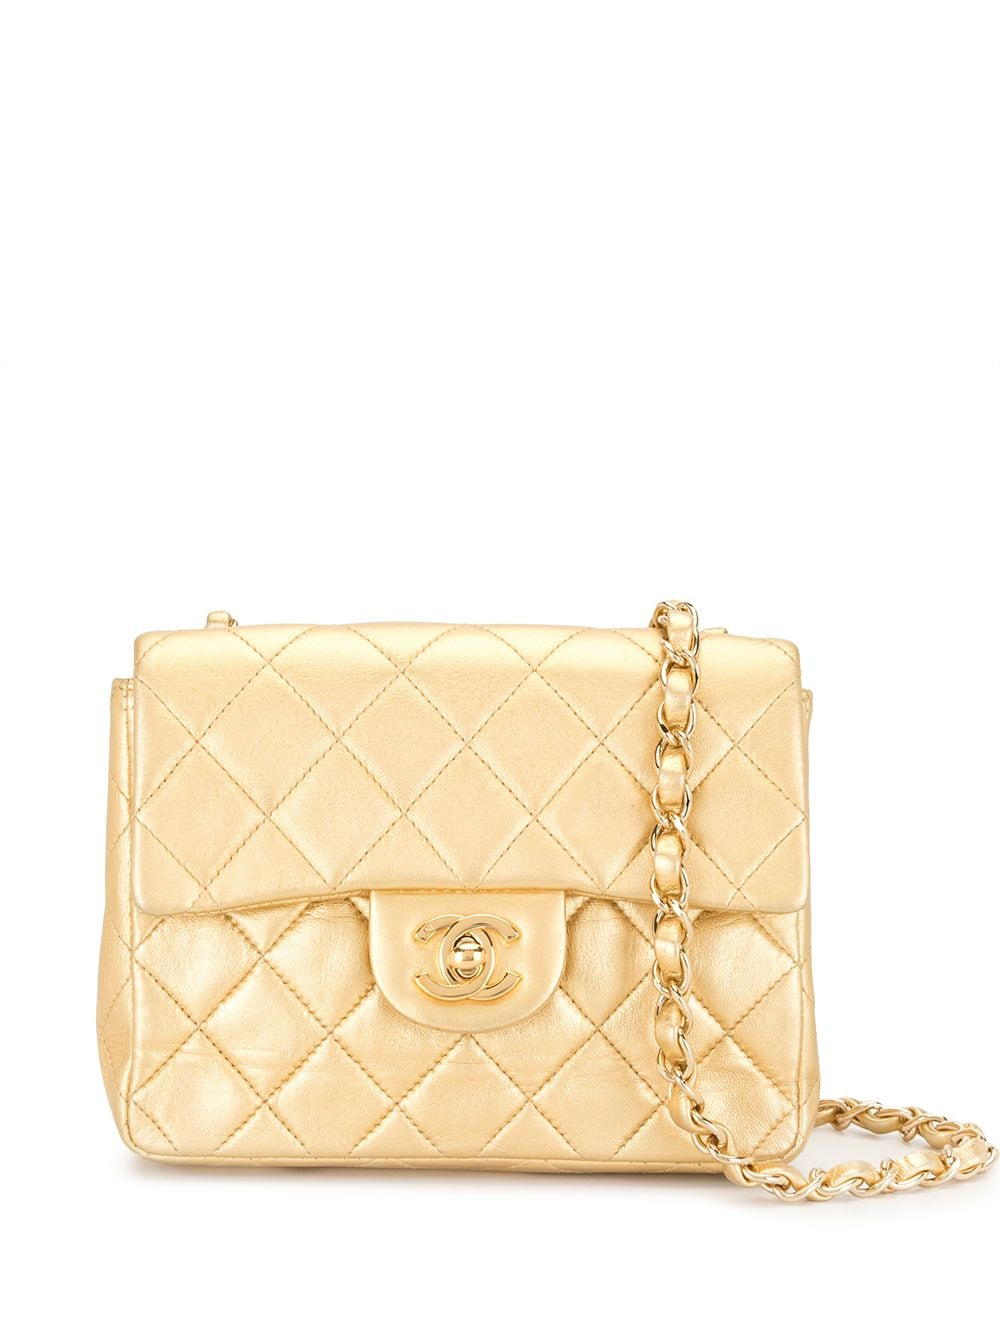 Chanel Pre-Owned 2002 Gesteppte Umhängetasche - Gold